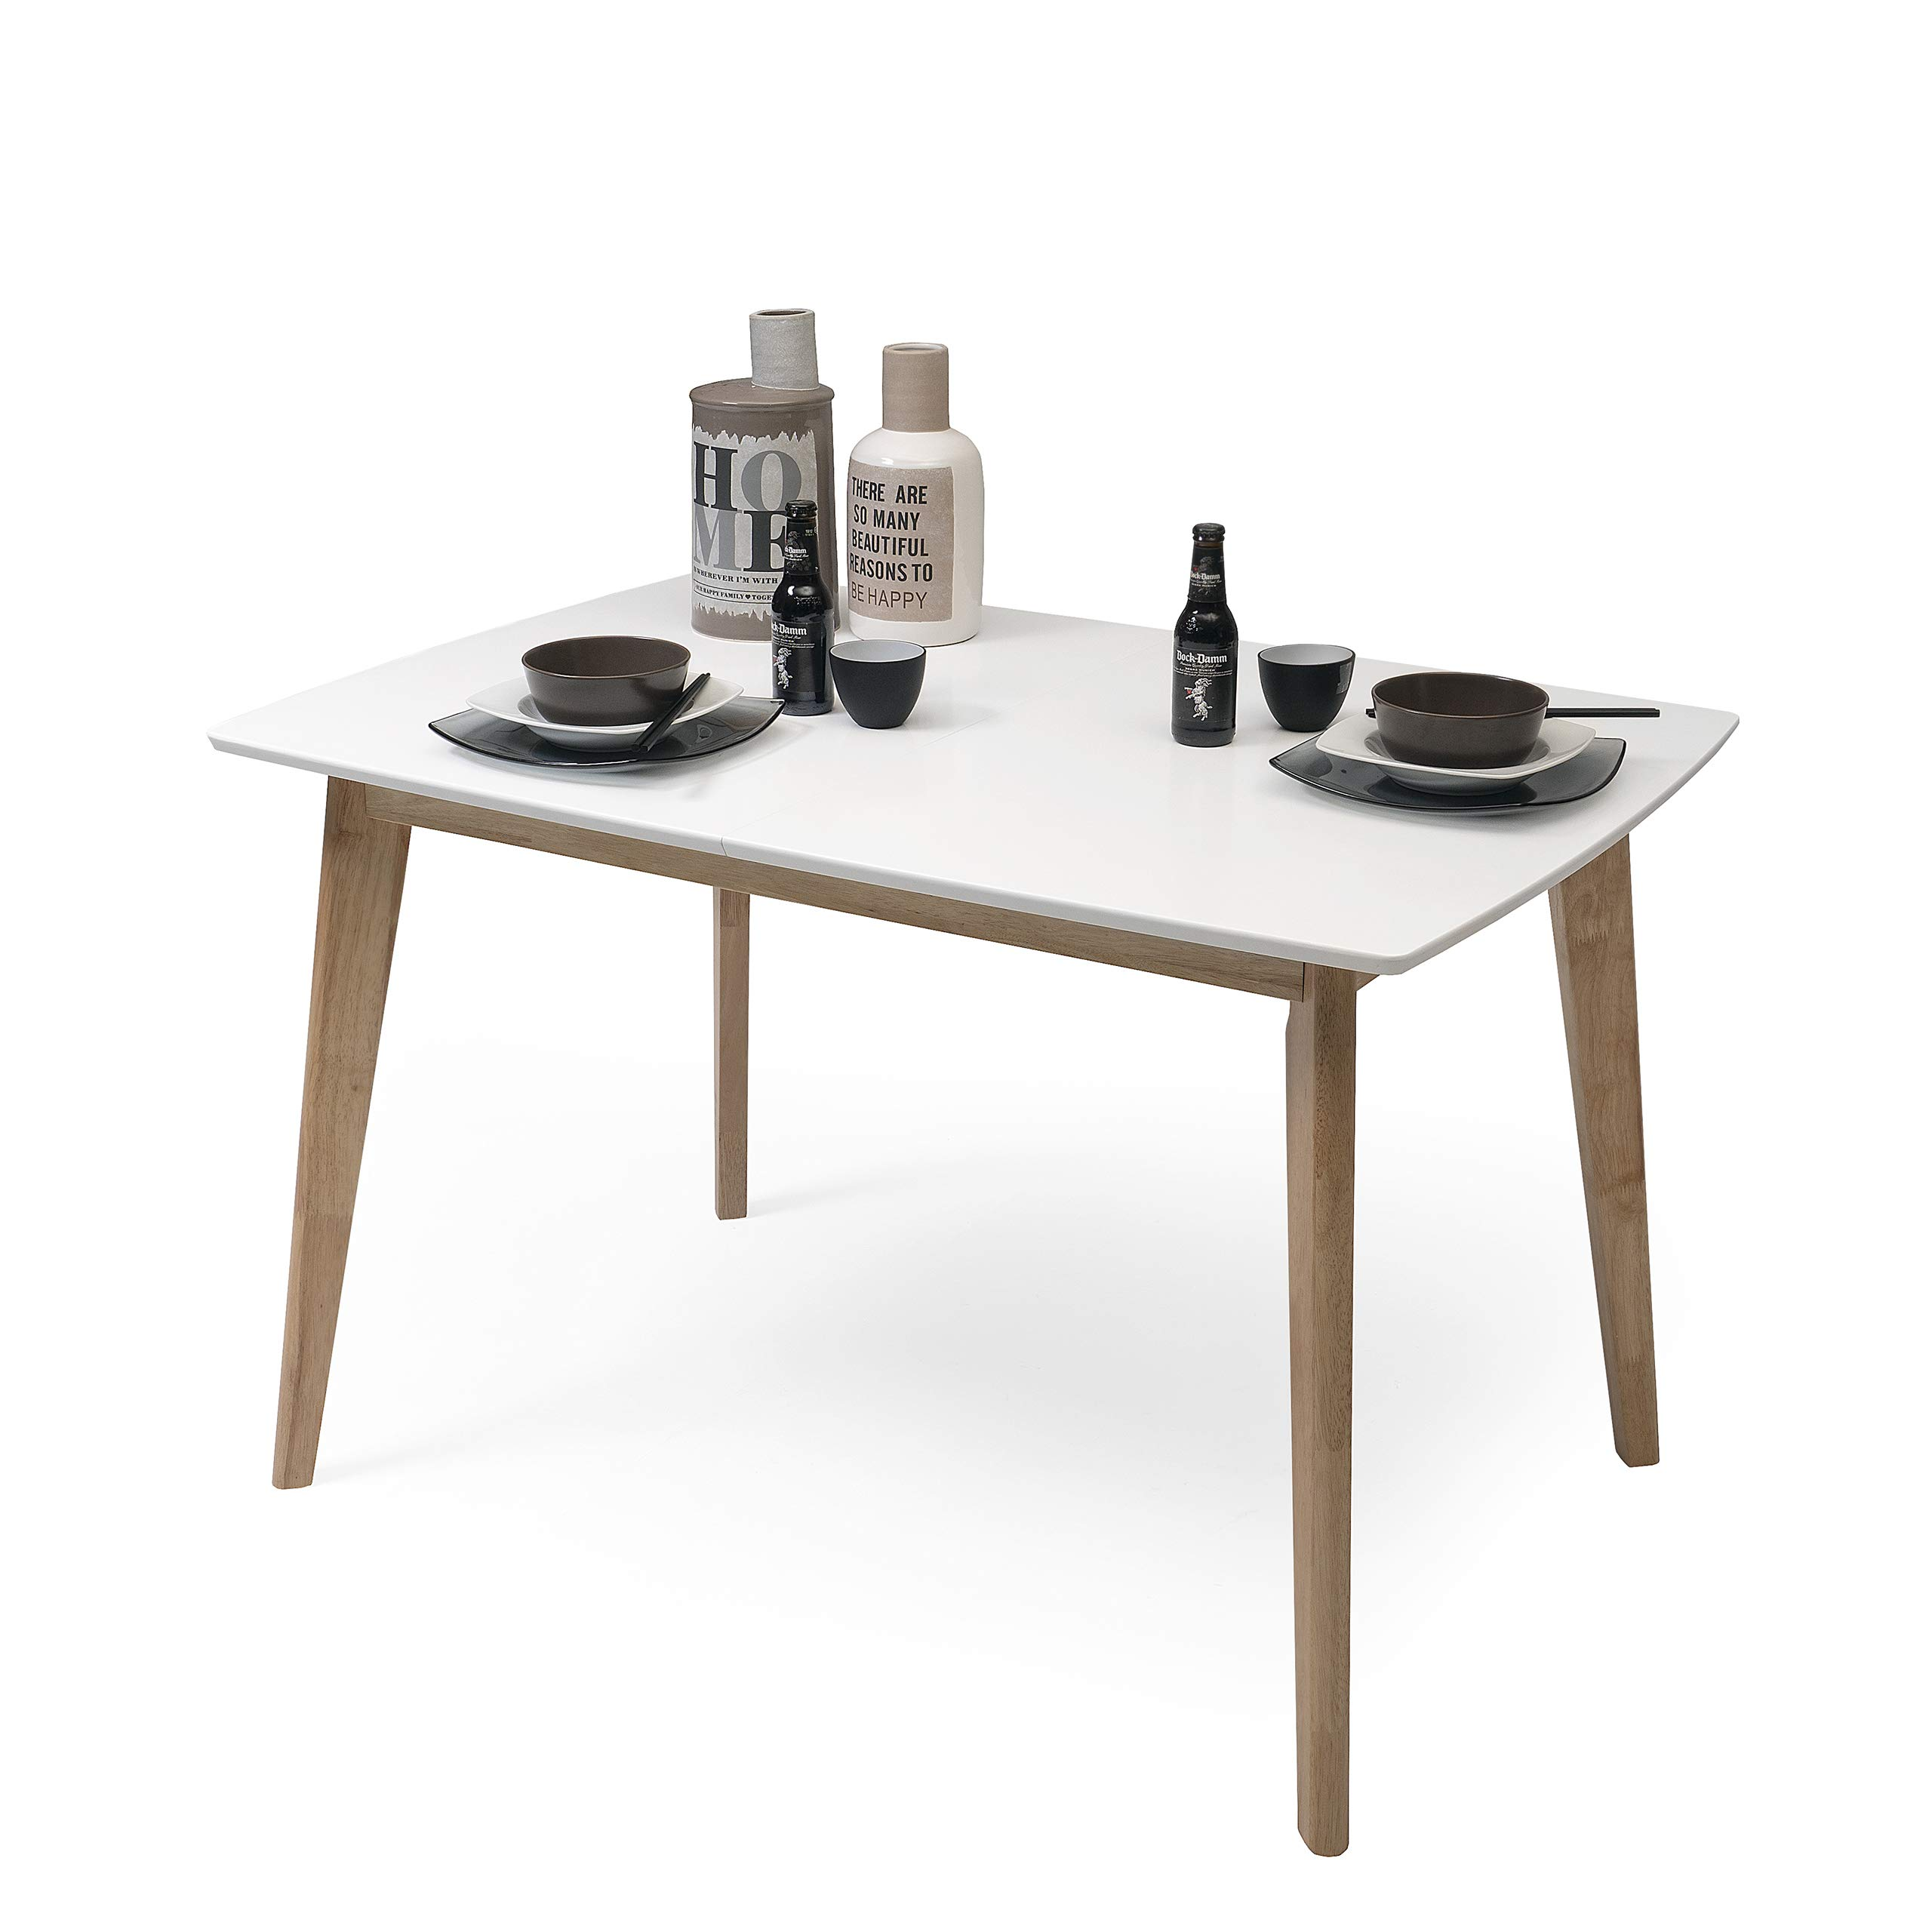 Homely - Mesa de Comedor-Cocina Extensible de diseño nórdico MELAKA sobre Lacado Blanco de 120/160x80 cm y Patas de Madera de Roble: Amazon.es: Hogar